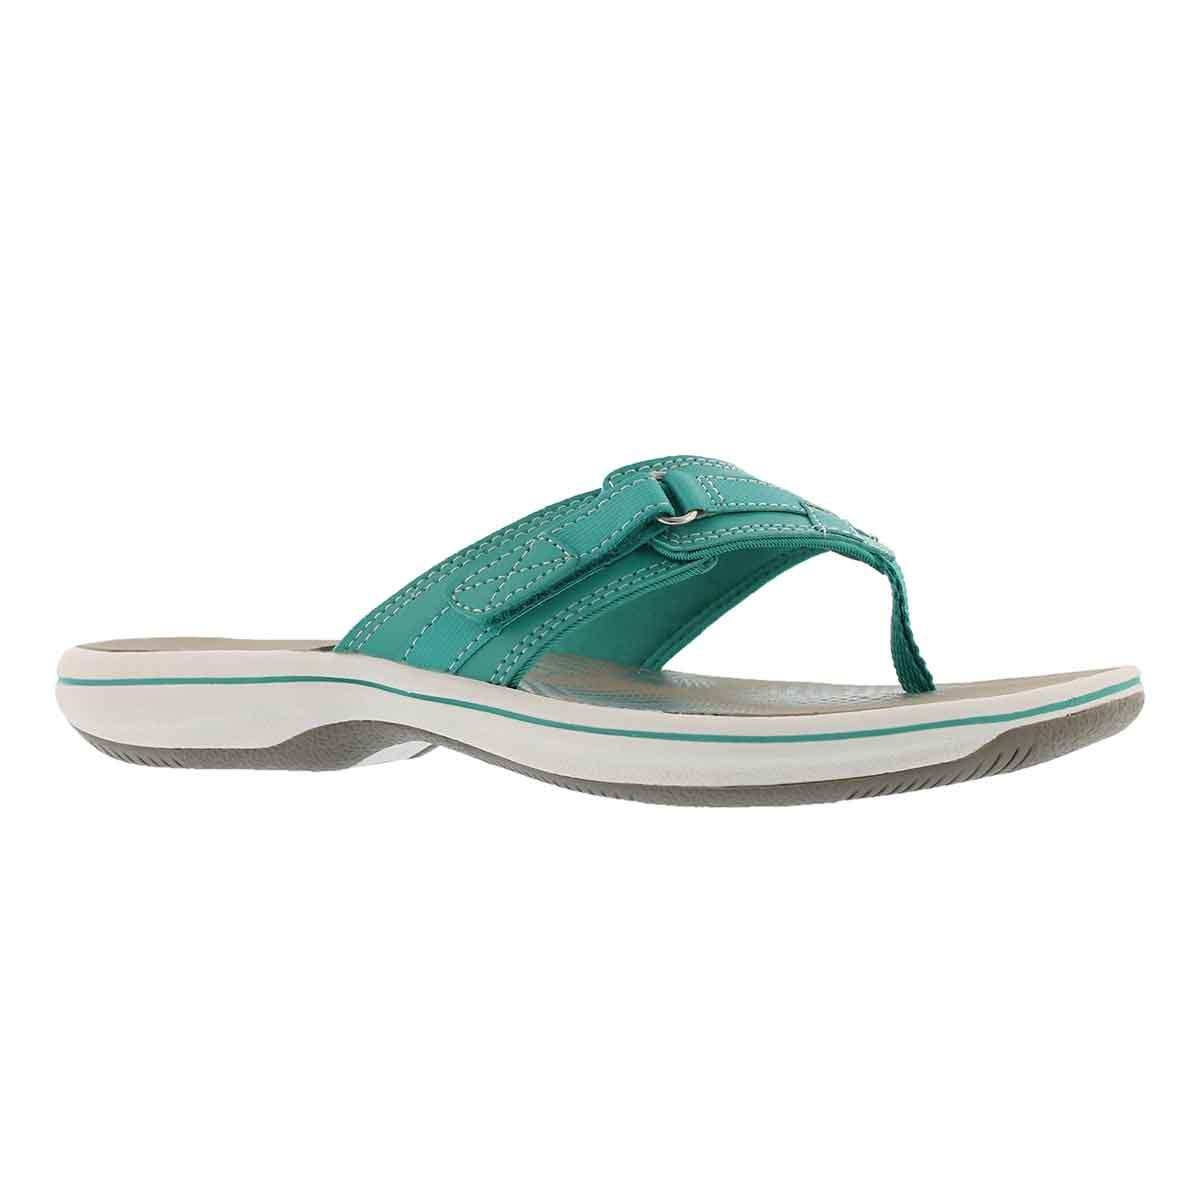 Women's BREEZE SEA red thong sandals